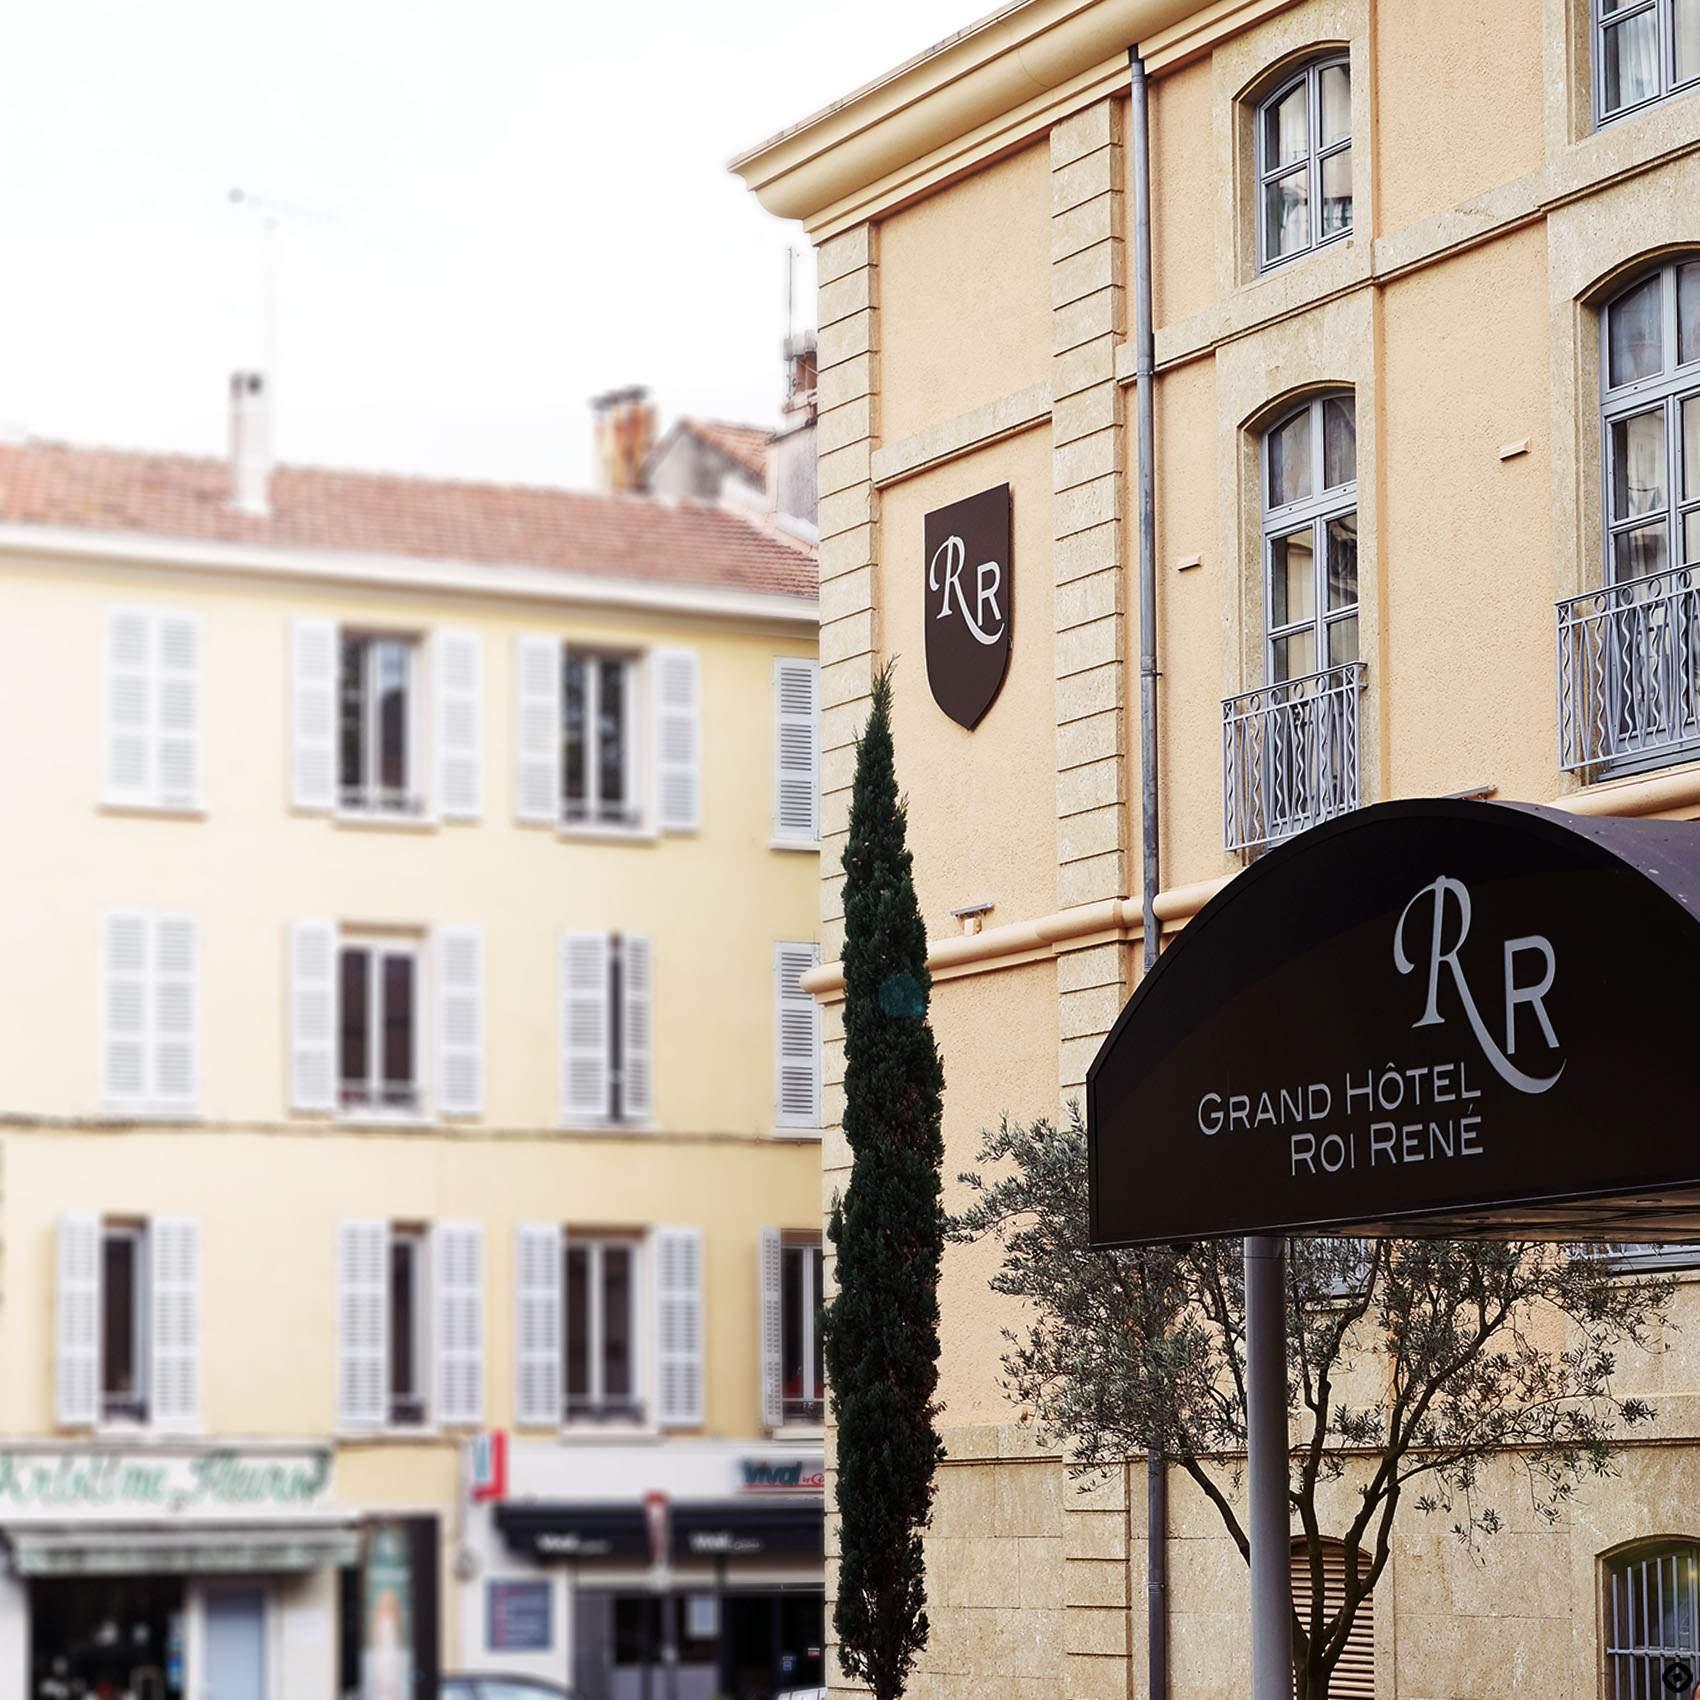 grand-hotel-roi-rene-blog-deco-design_6